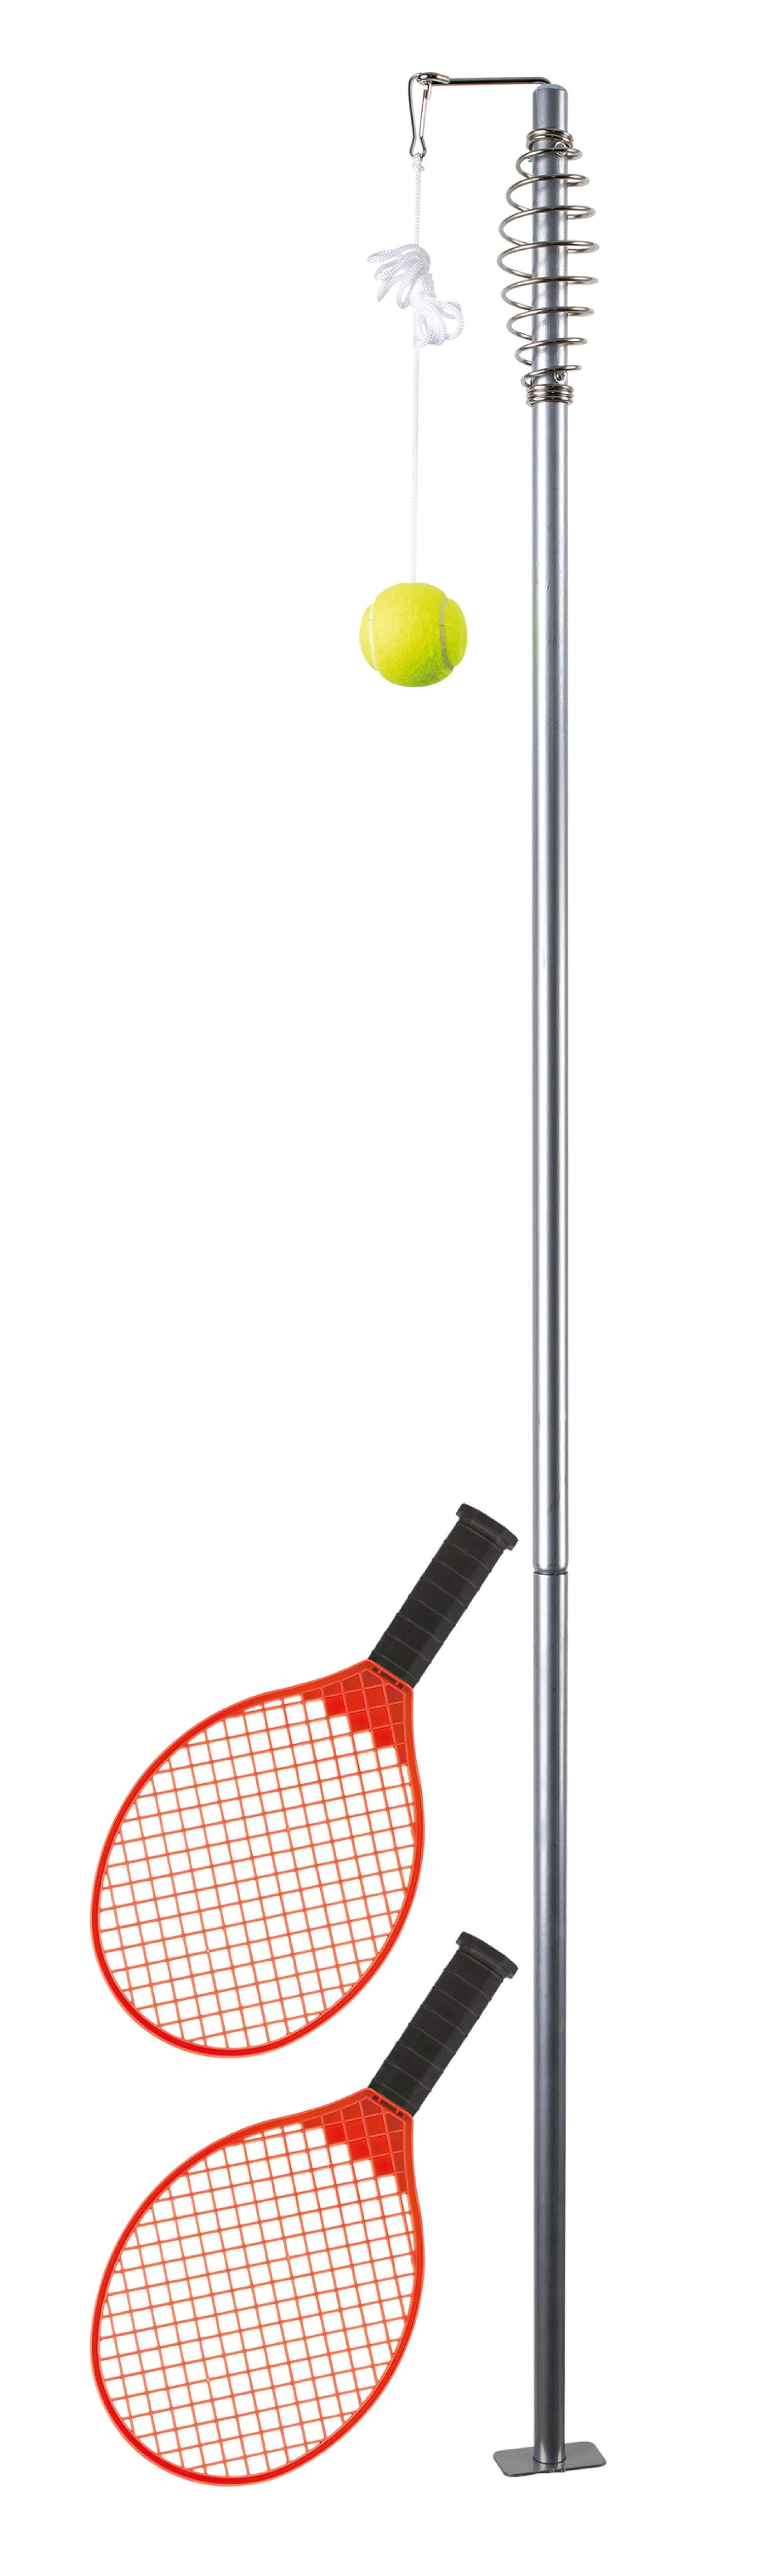 Playfun - Pole Tennis (8616)